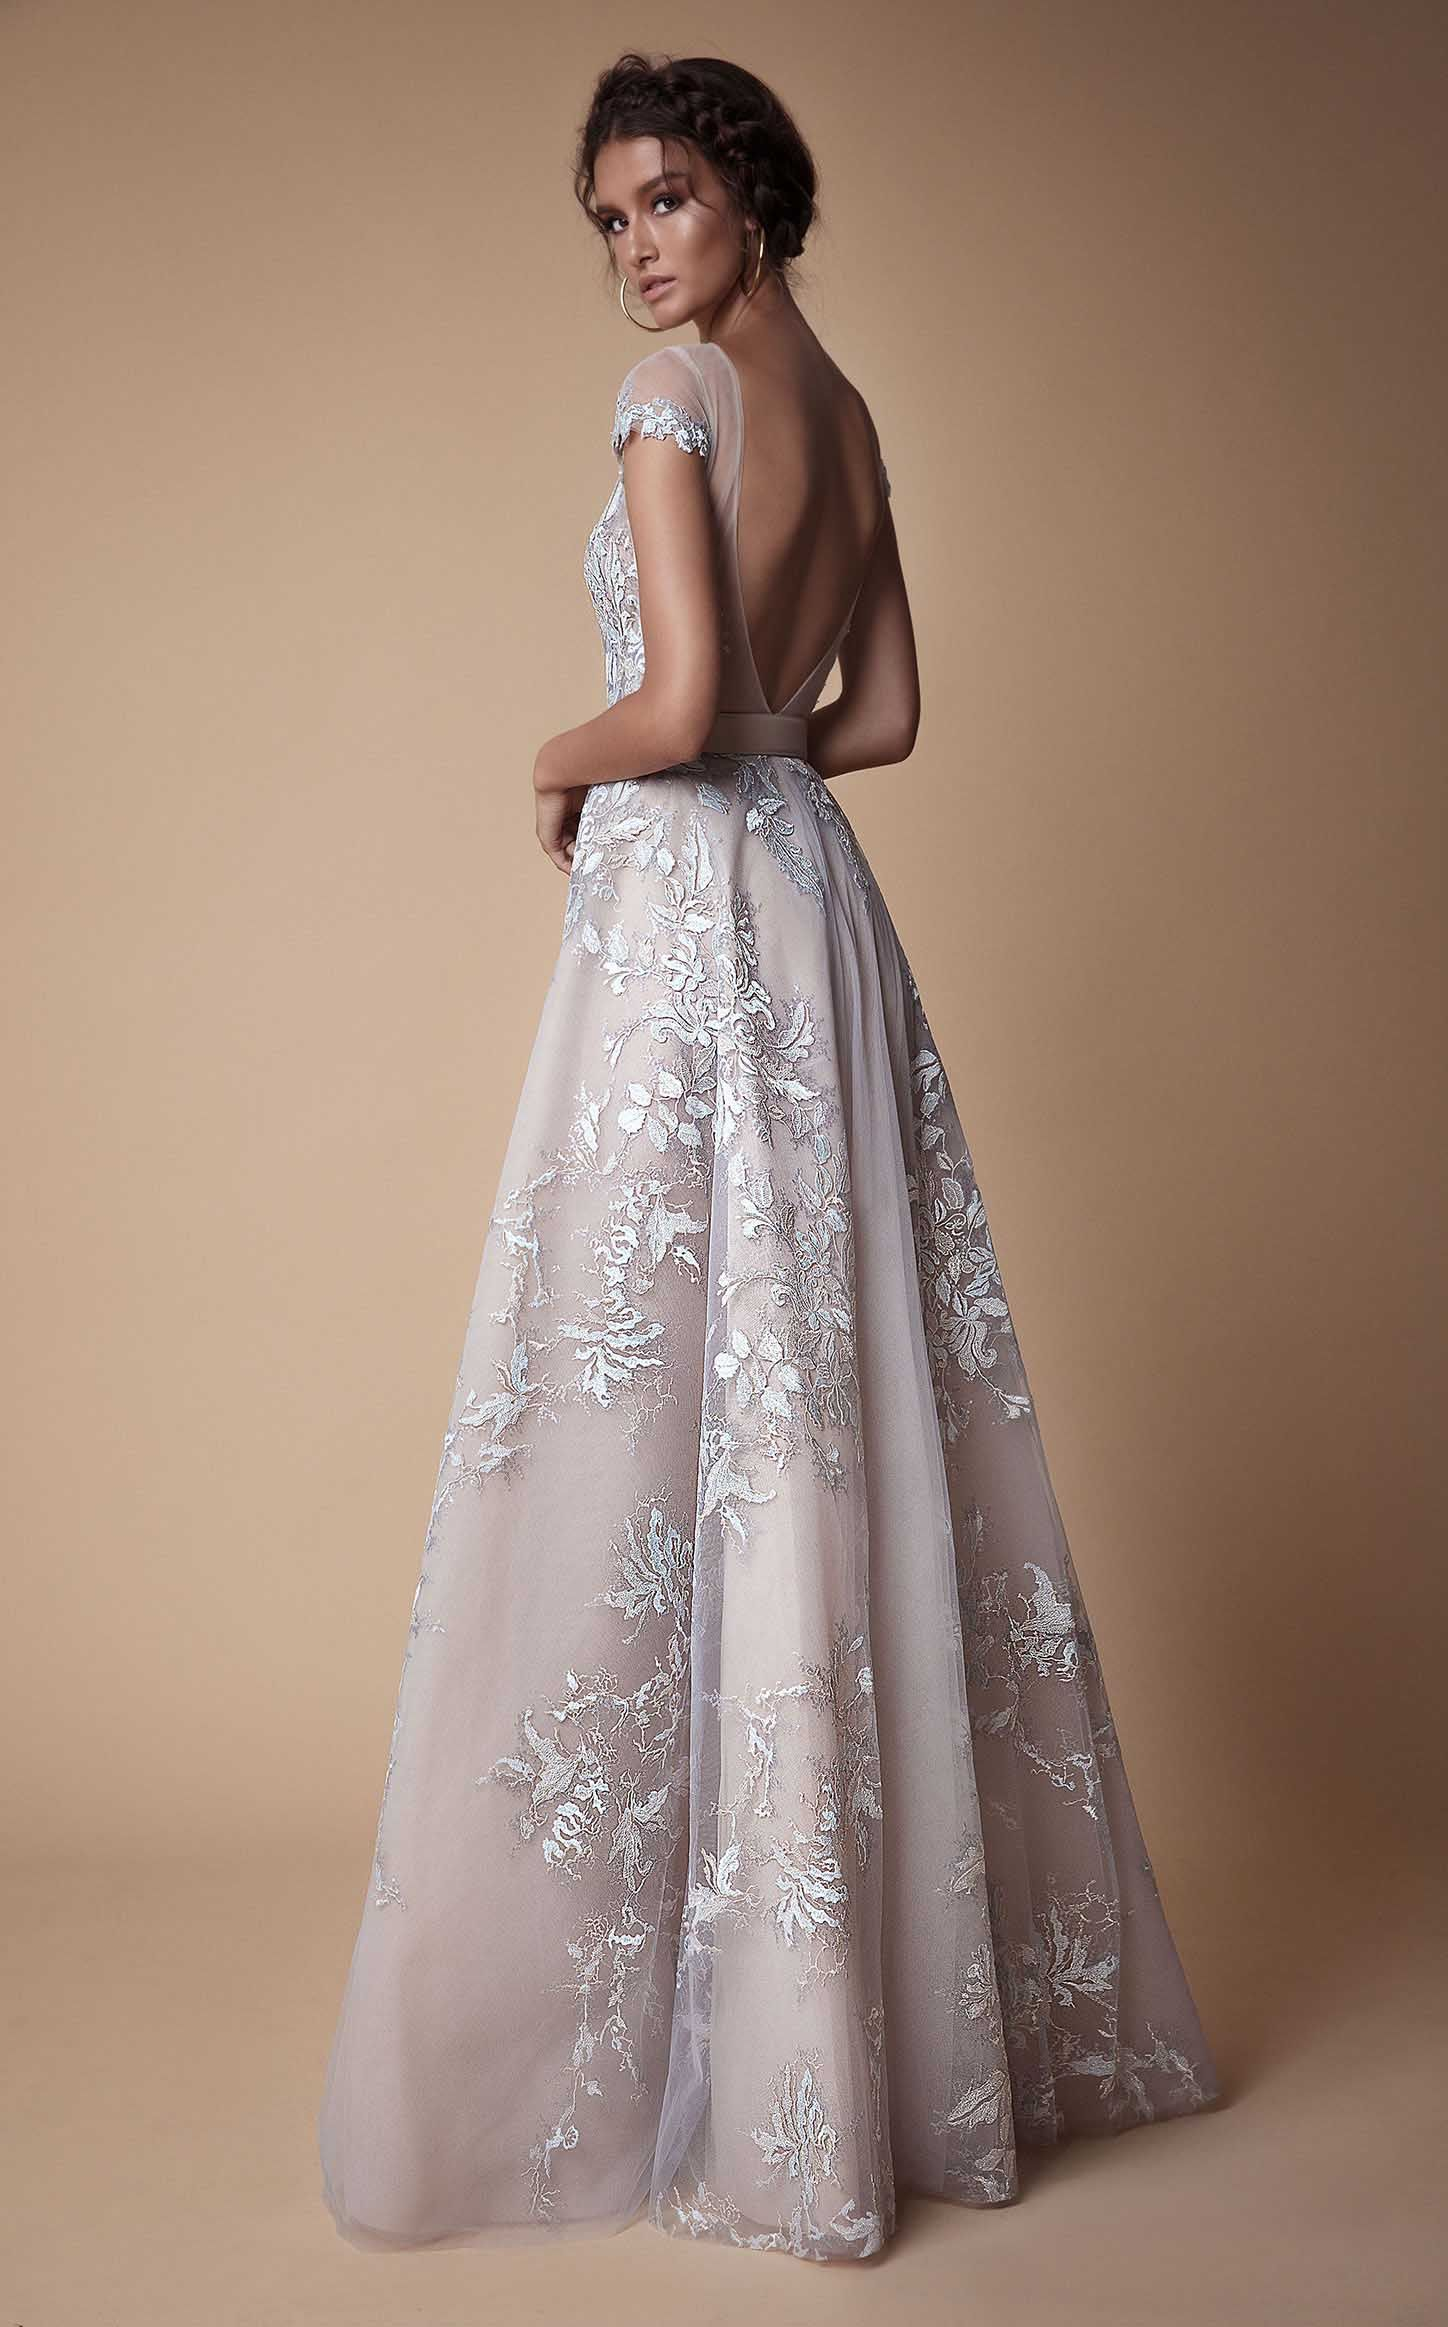 Fw berta dresses pinterest african print skirt